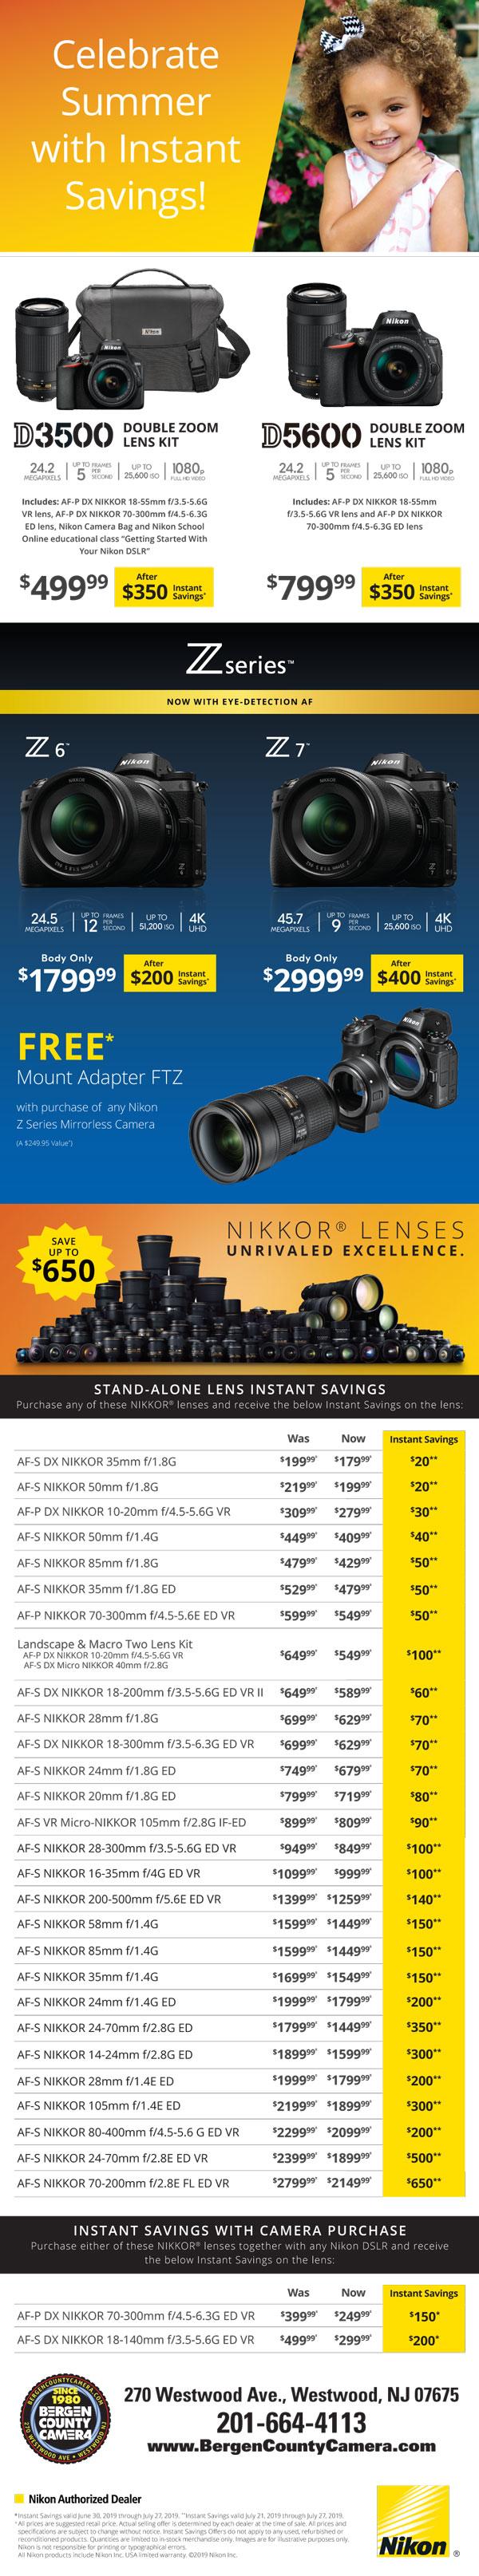 Nikon Camera and Lens rebates for July